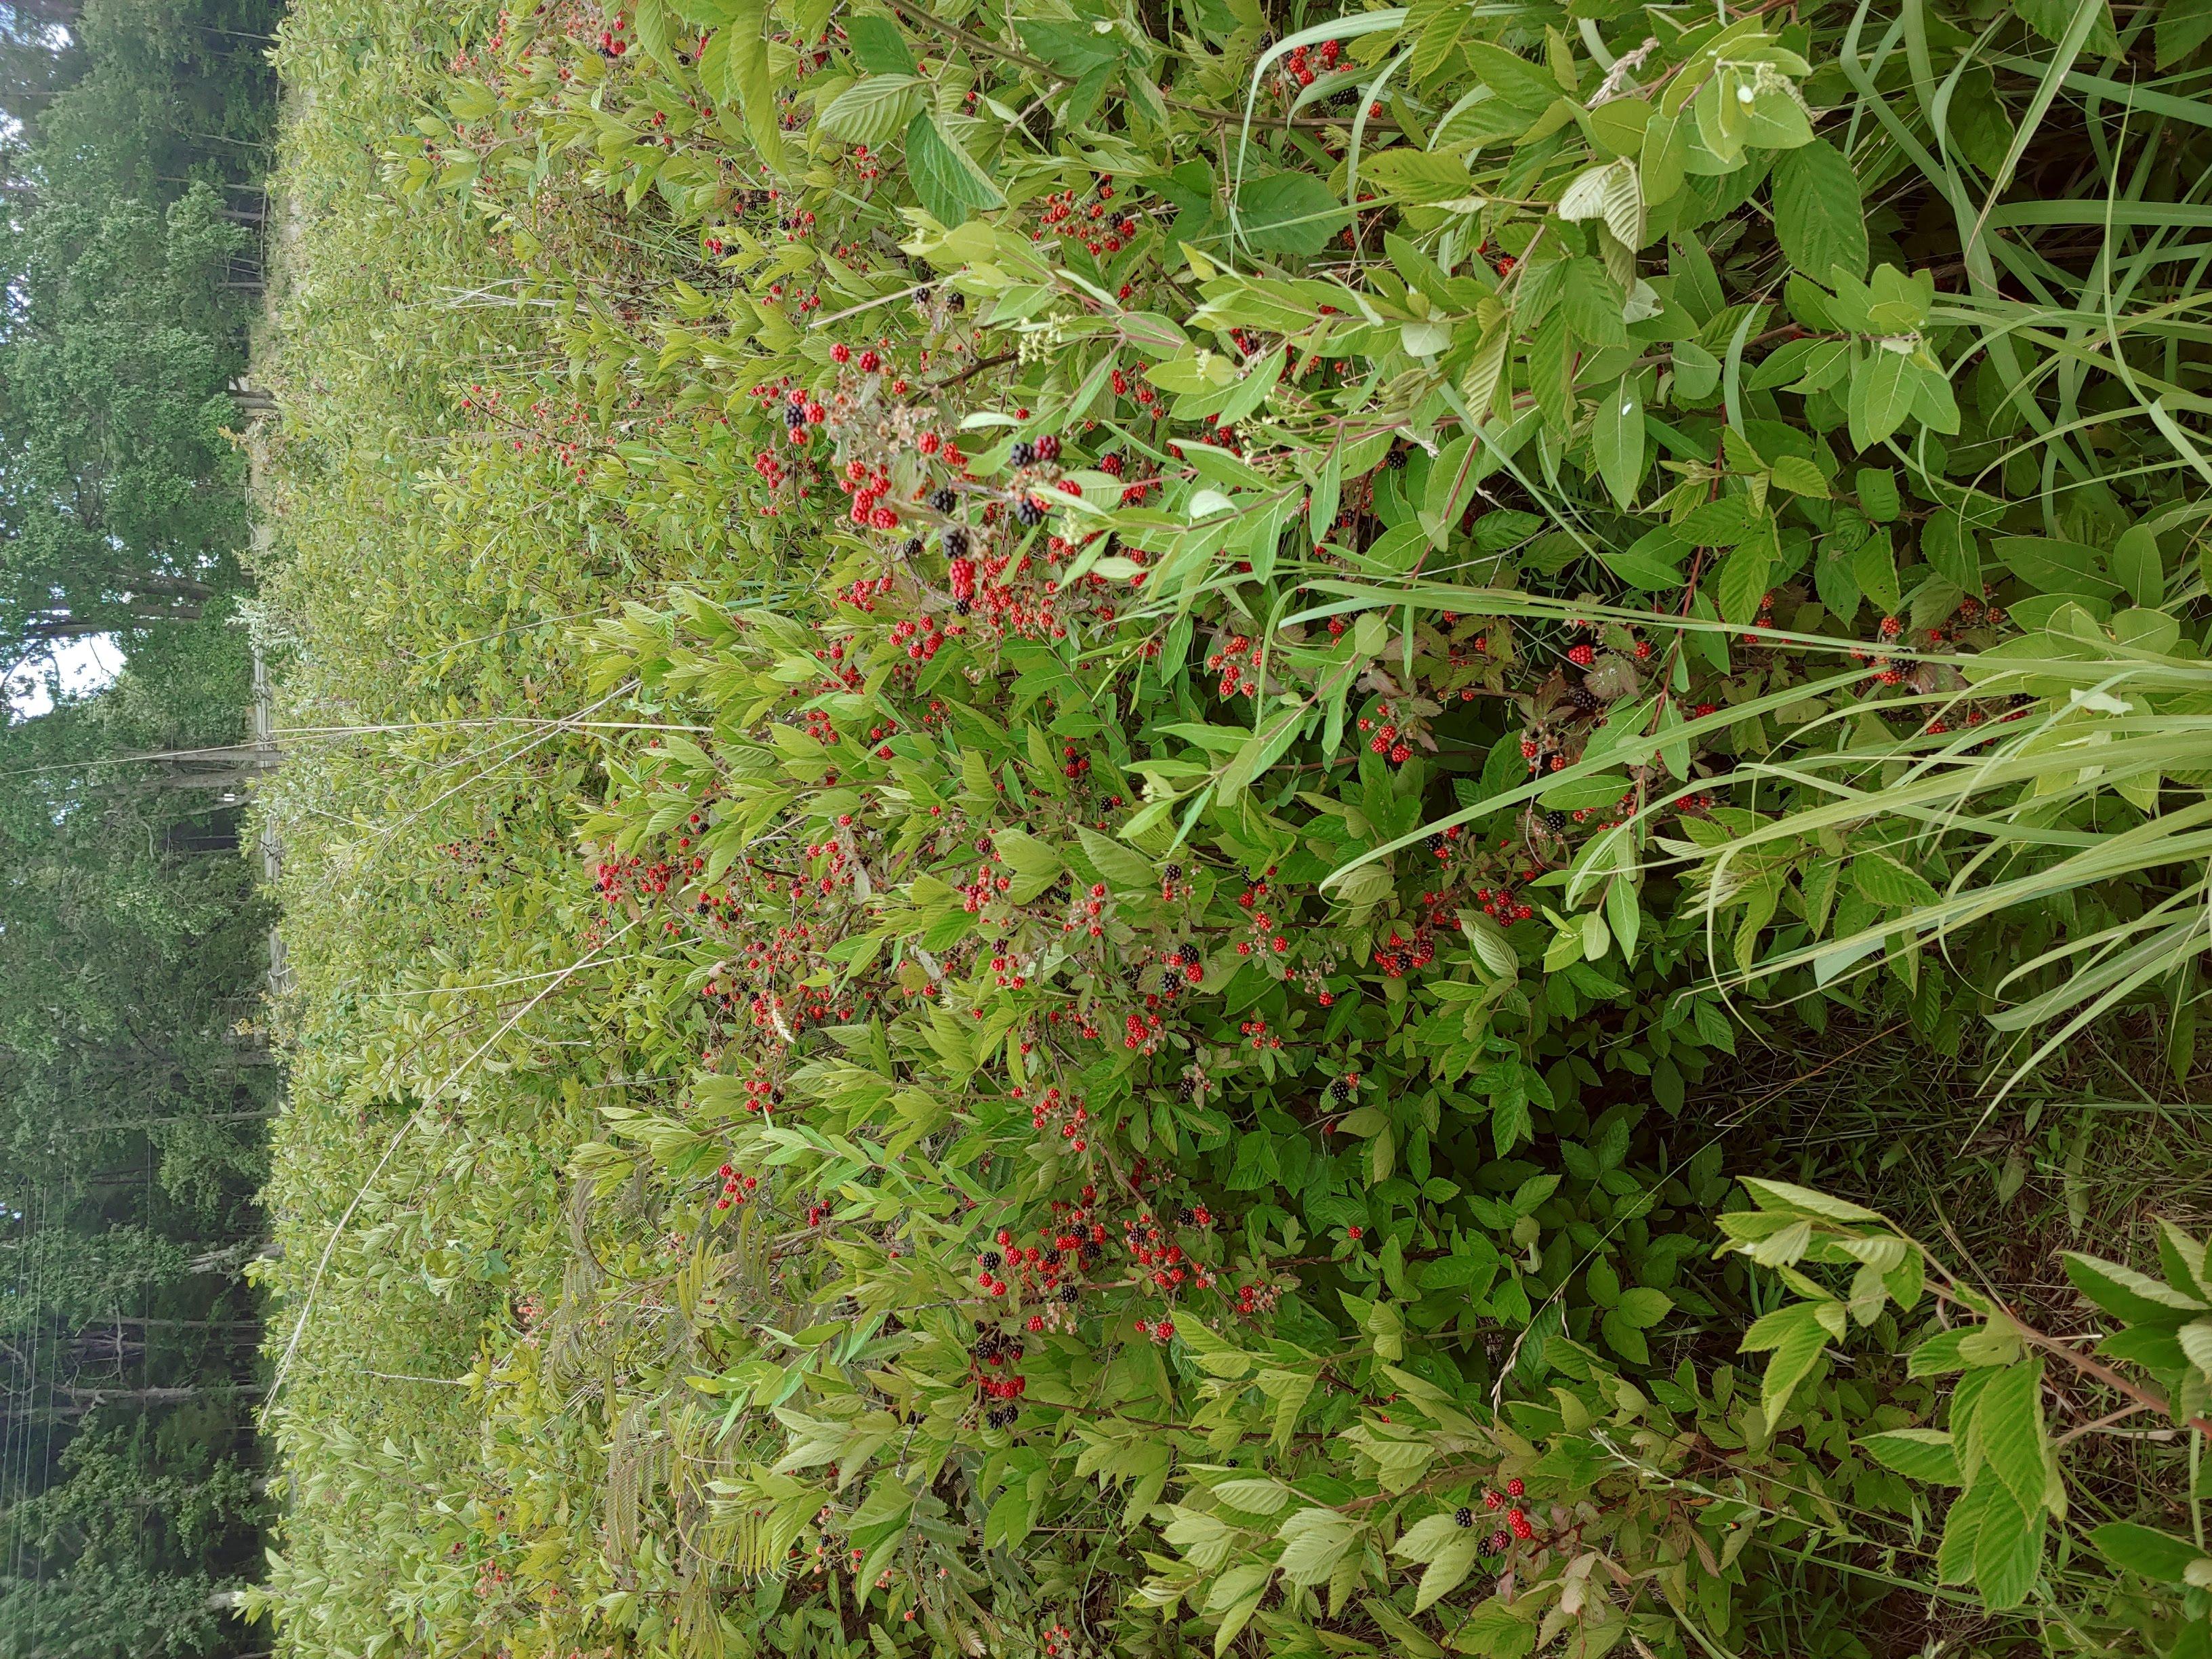 Raspberry battlefield in Virginia